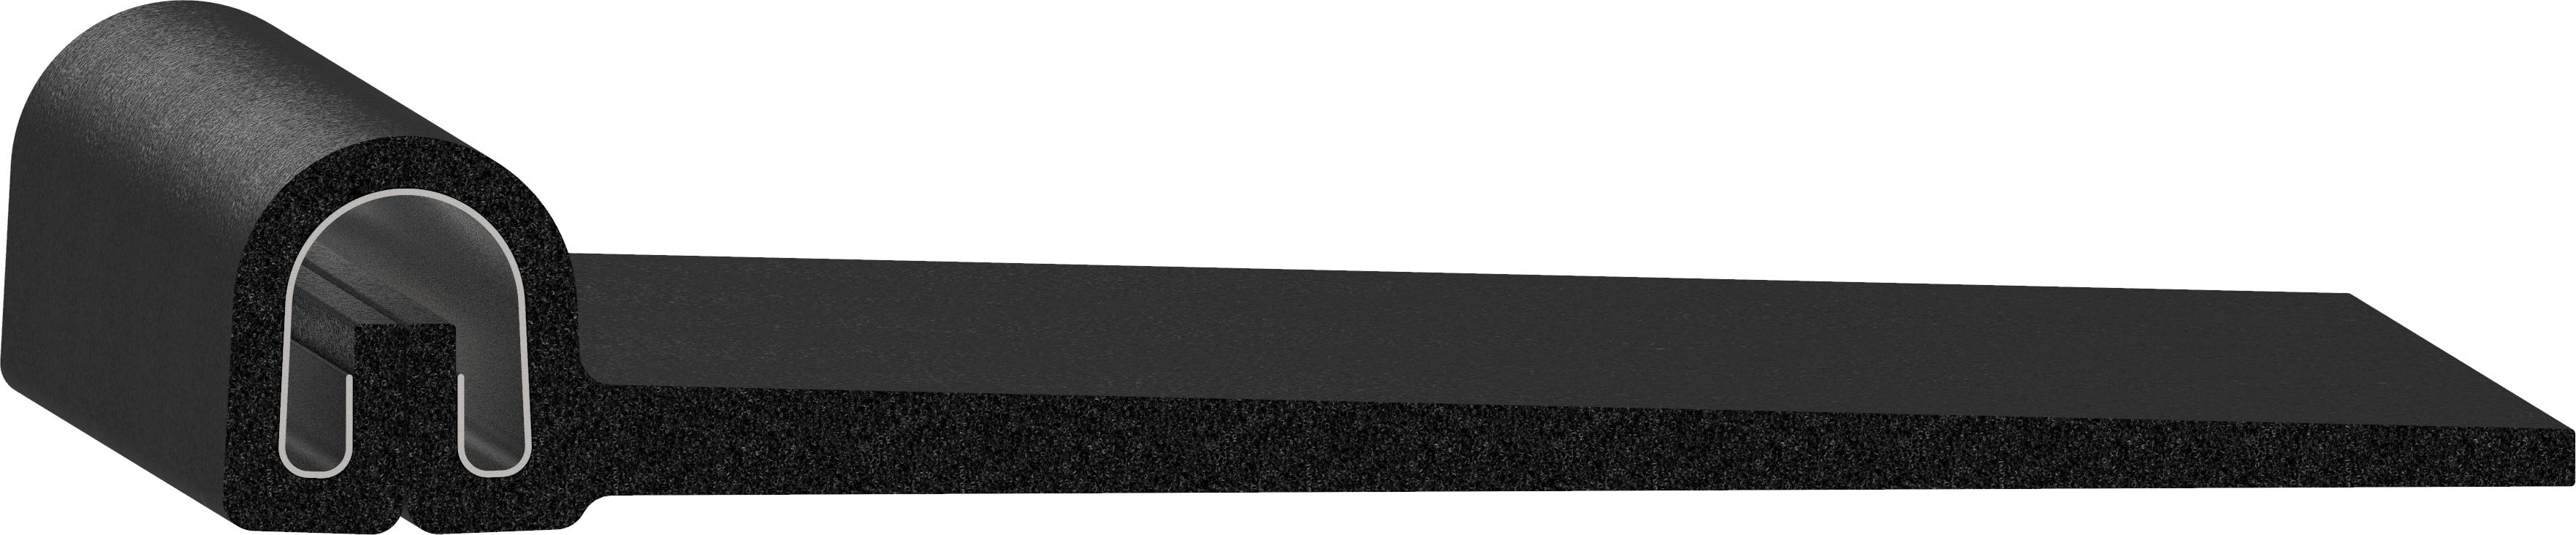 Uni-Grip part: ED-5340